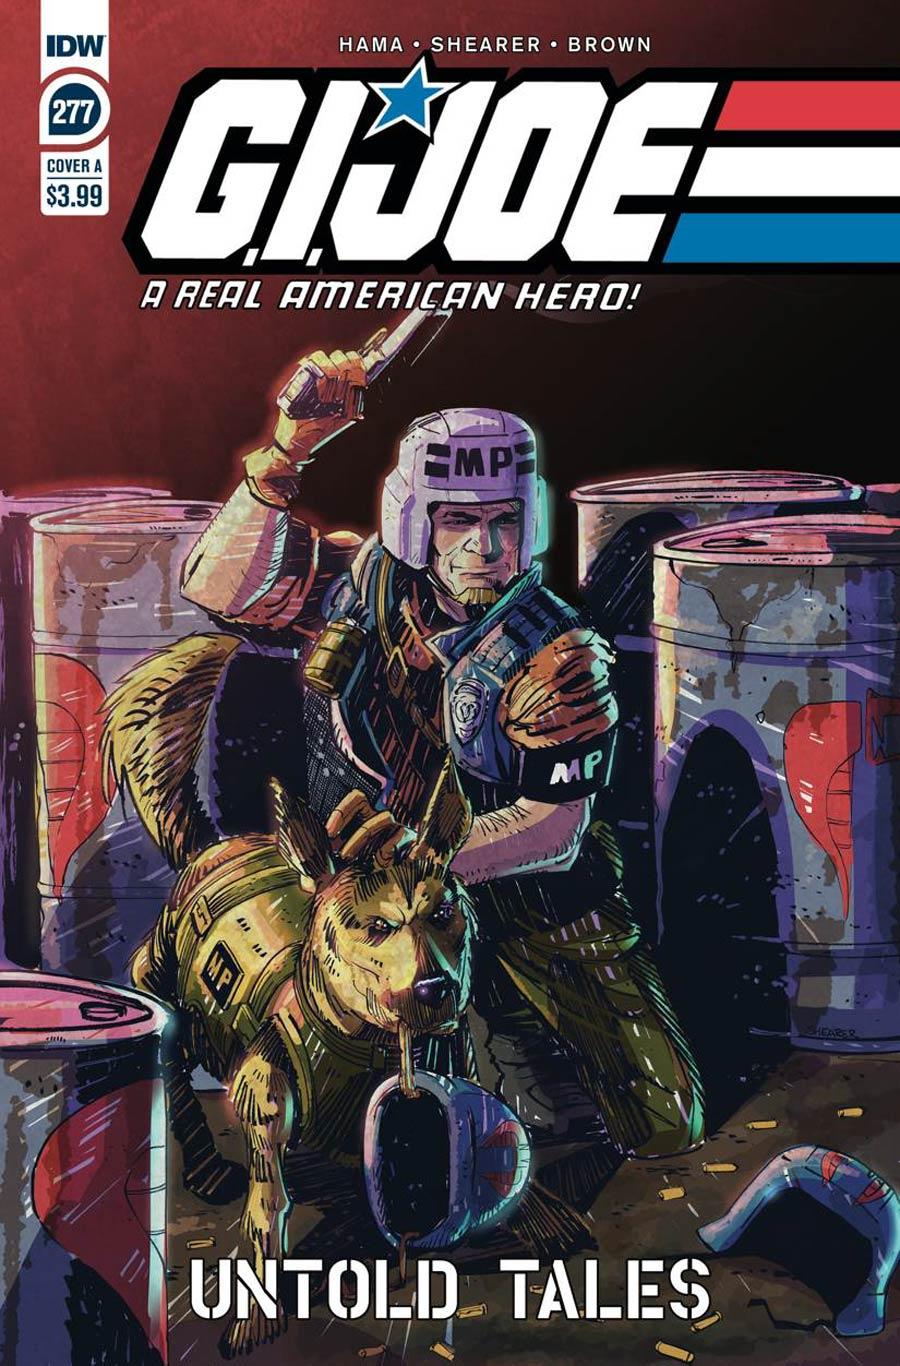 GI Joe A Real American Hero #277 Cover A Regular Brian Shearer Cover